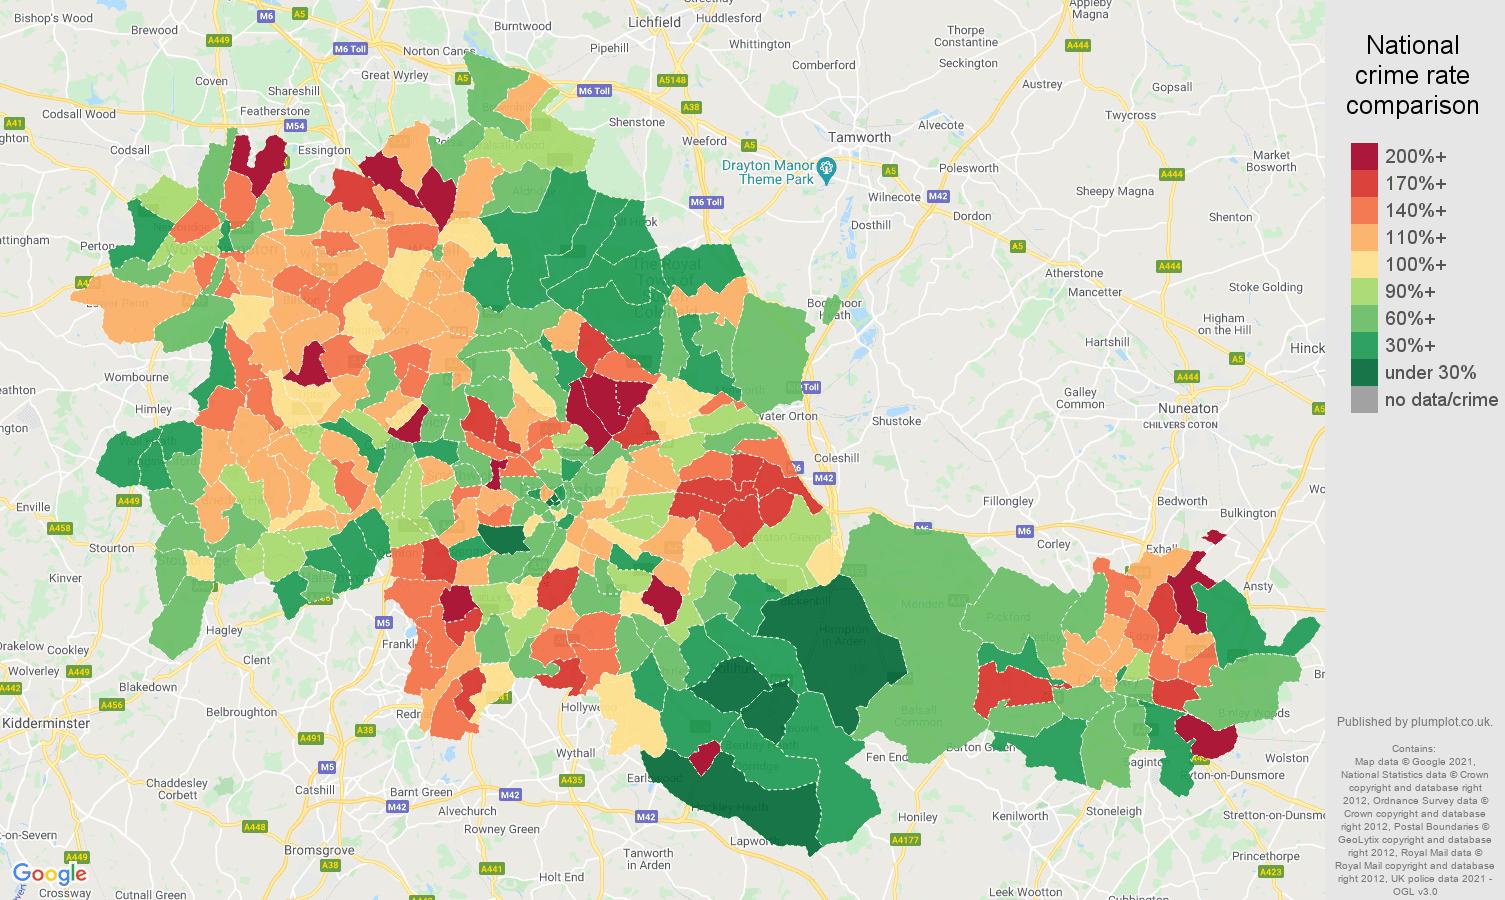 West Midlands county criminal damage and arson crime rate comparison map